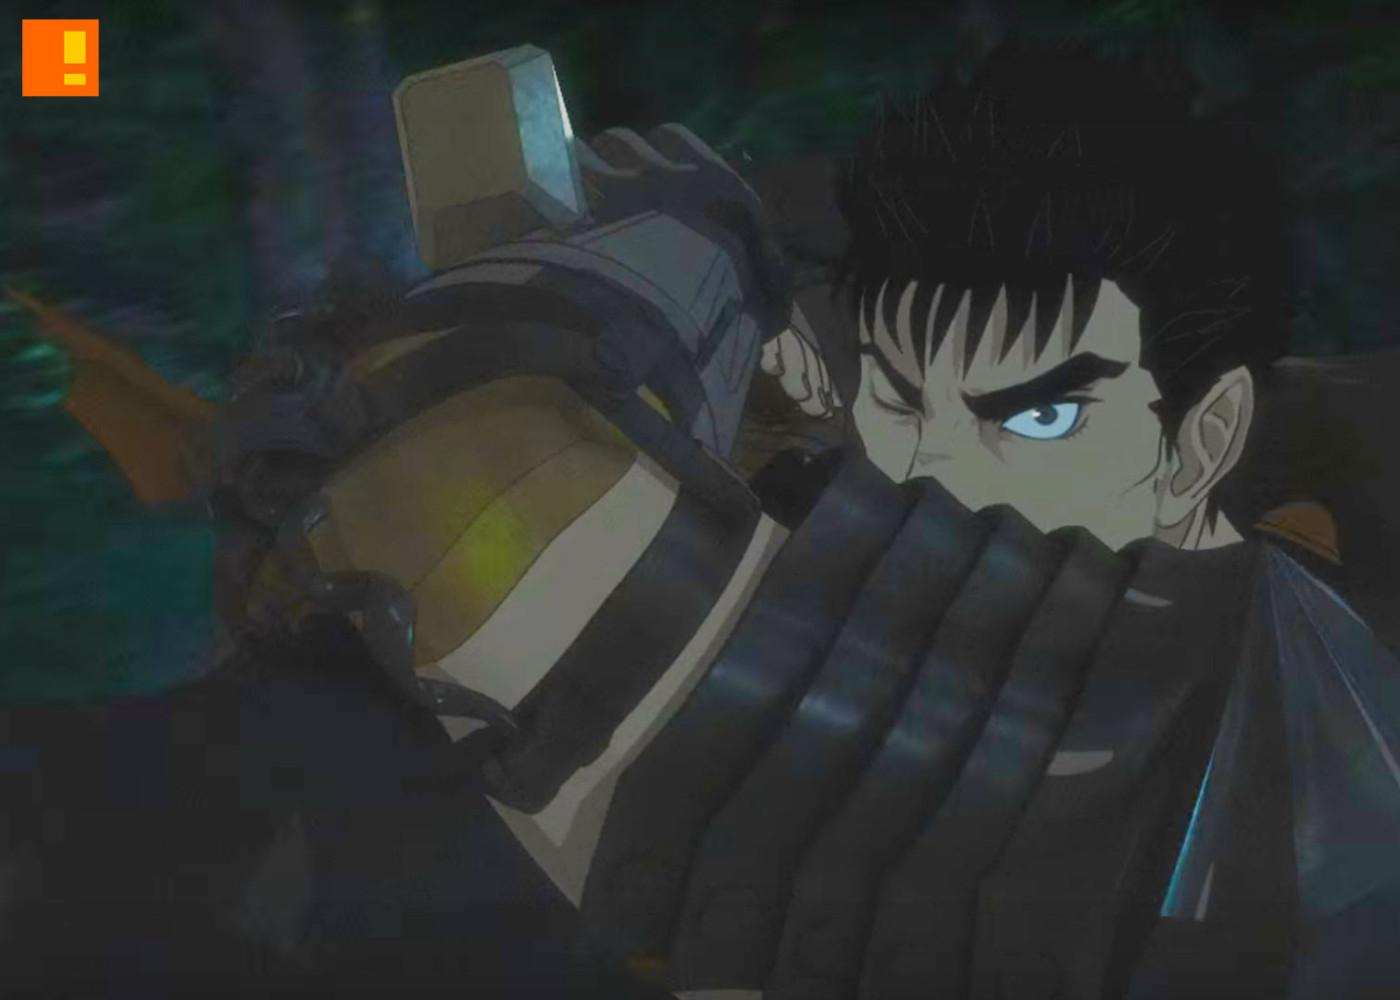 berserk anime. the action pixel. @theactionpixel. entertainment on tap